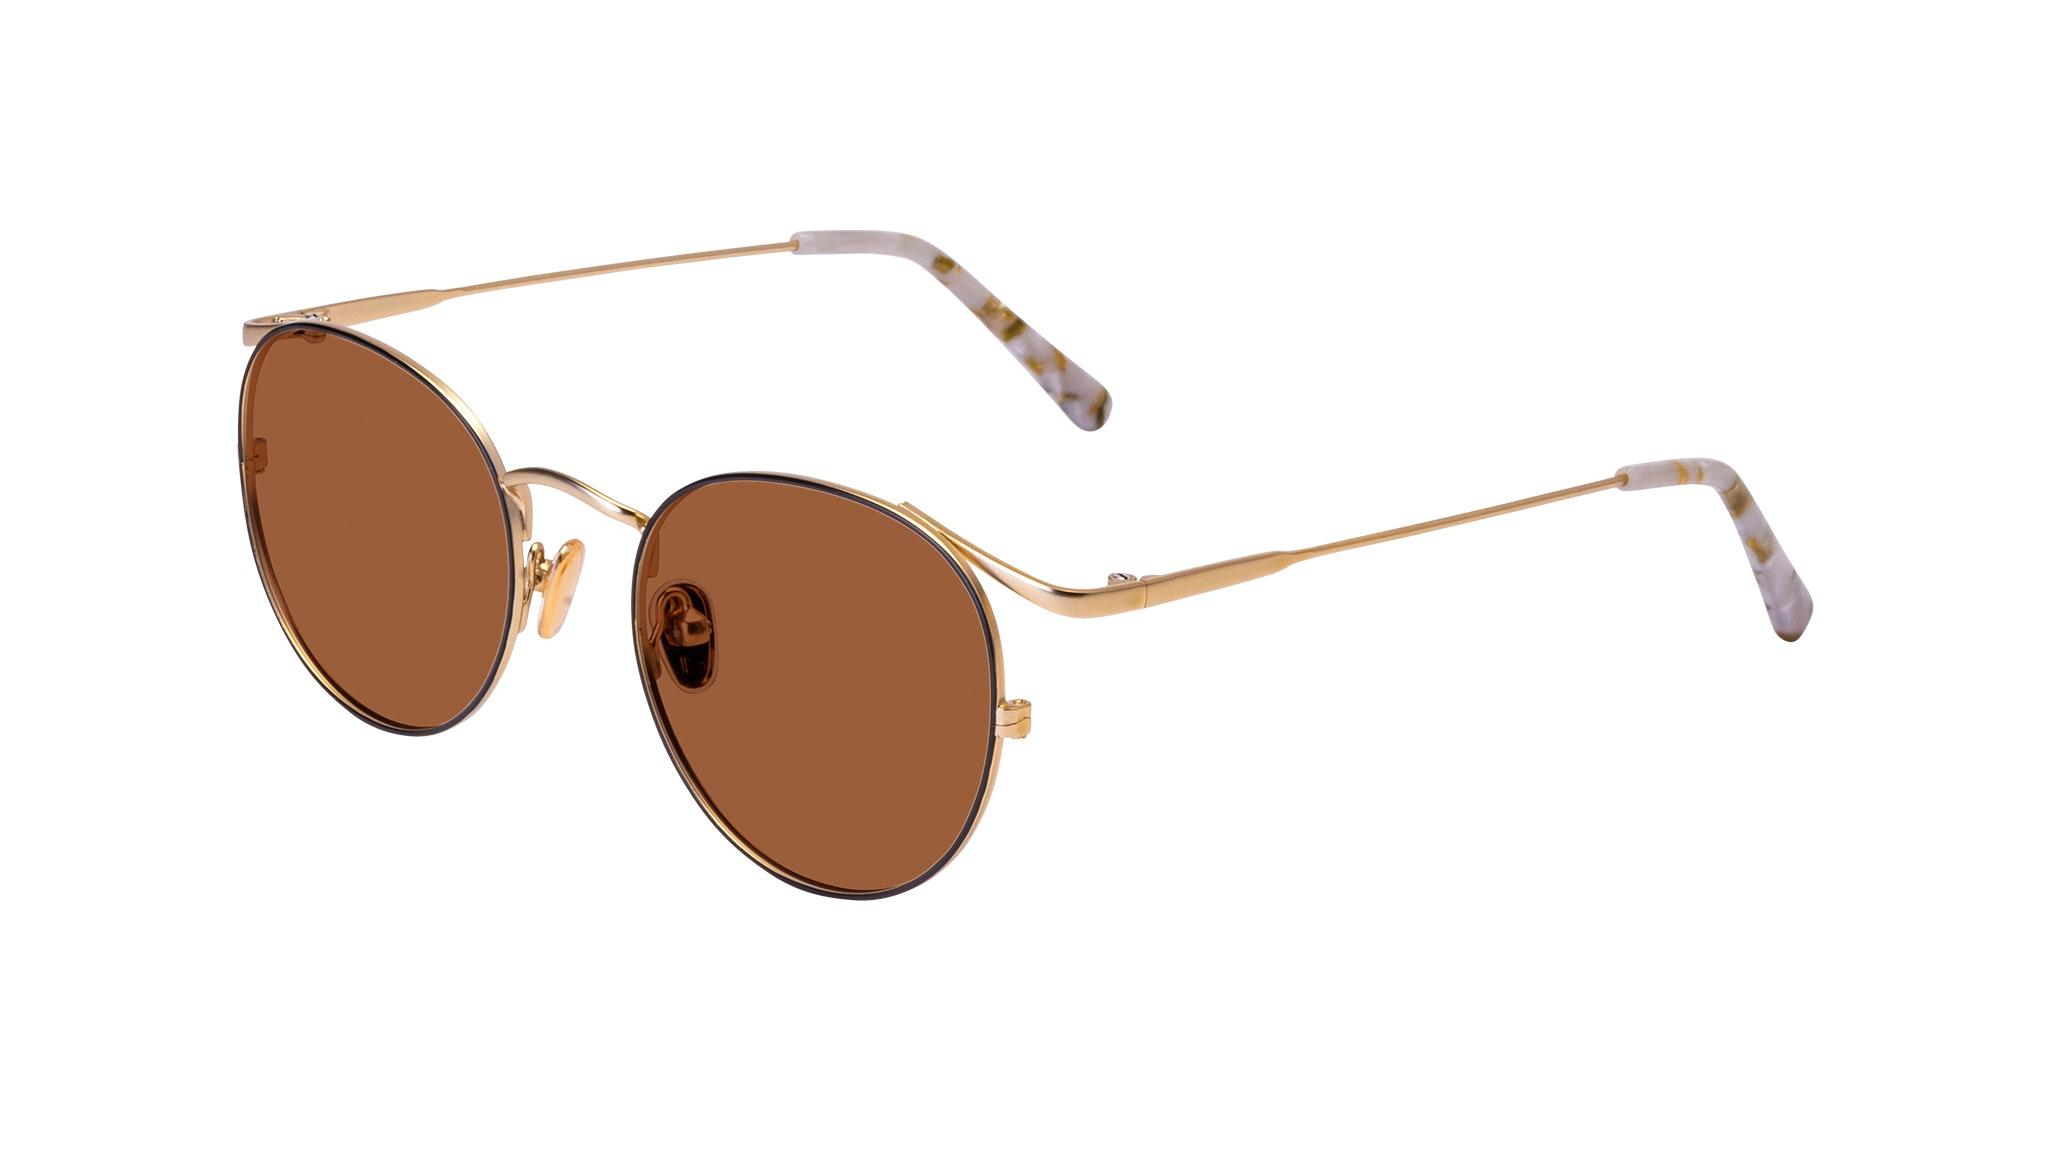 Affordable Fashion Glasses Round Sunglasses Women Curve Deep Gold Tilt